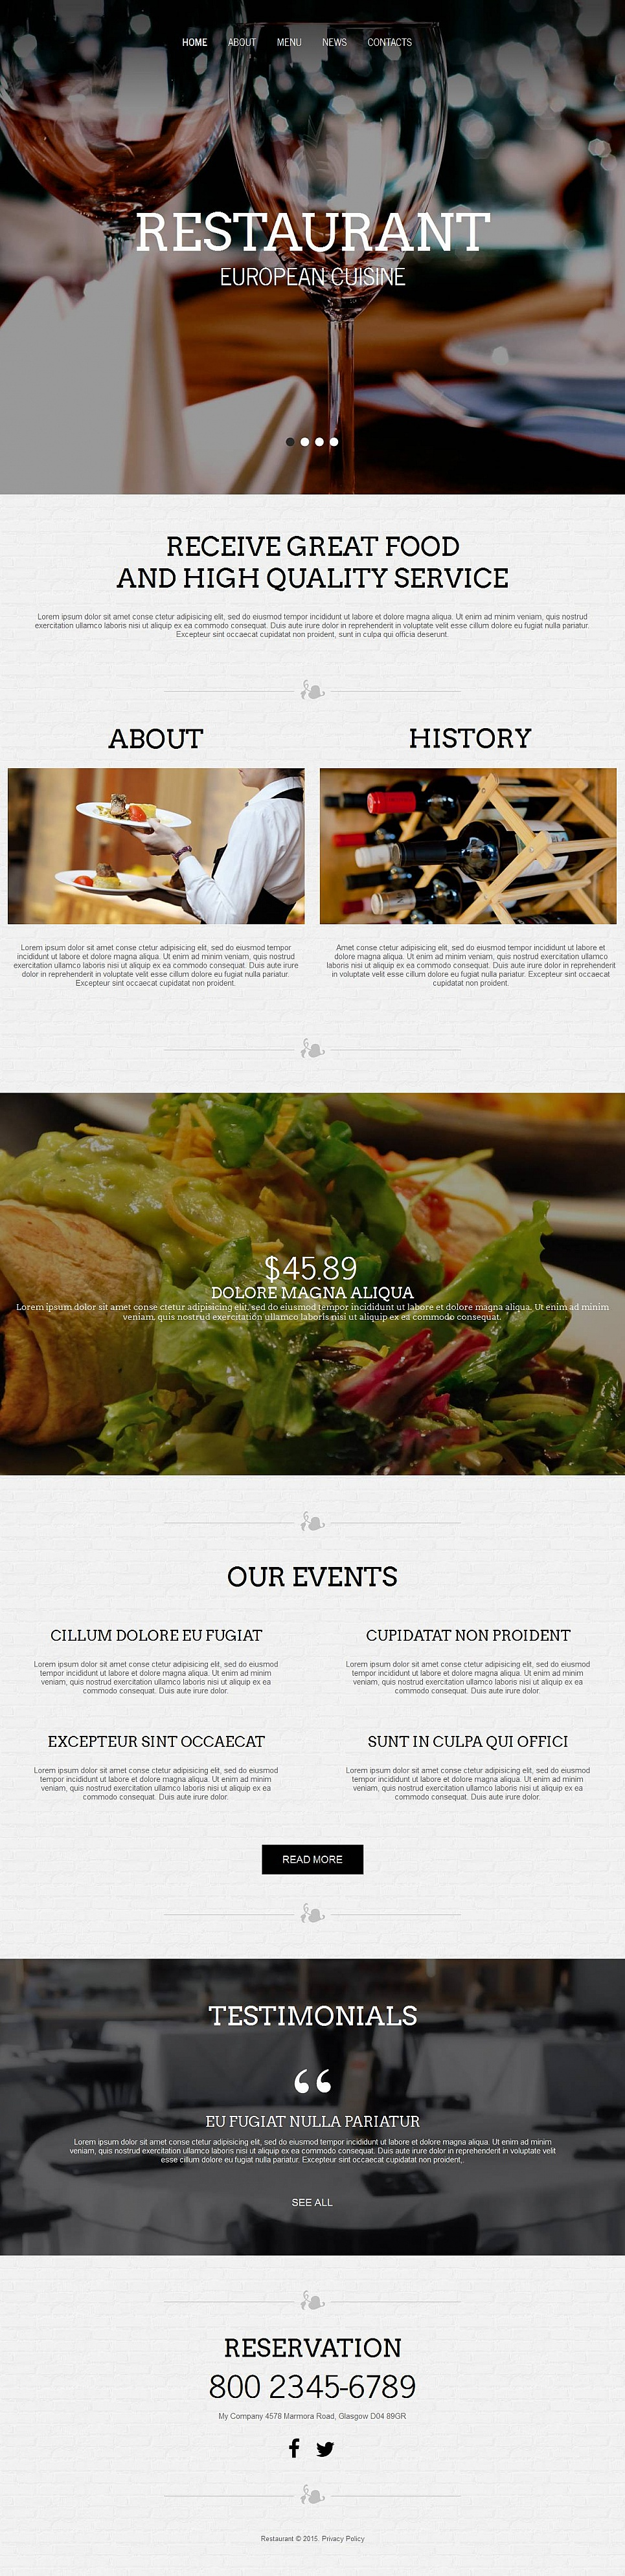 MotoCMS HTML Шаблон #53062 из категории Кафе и рестораны - image